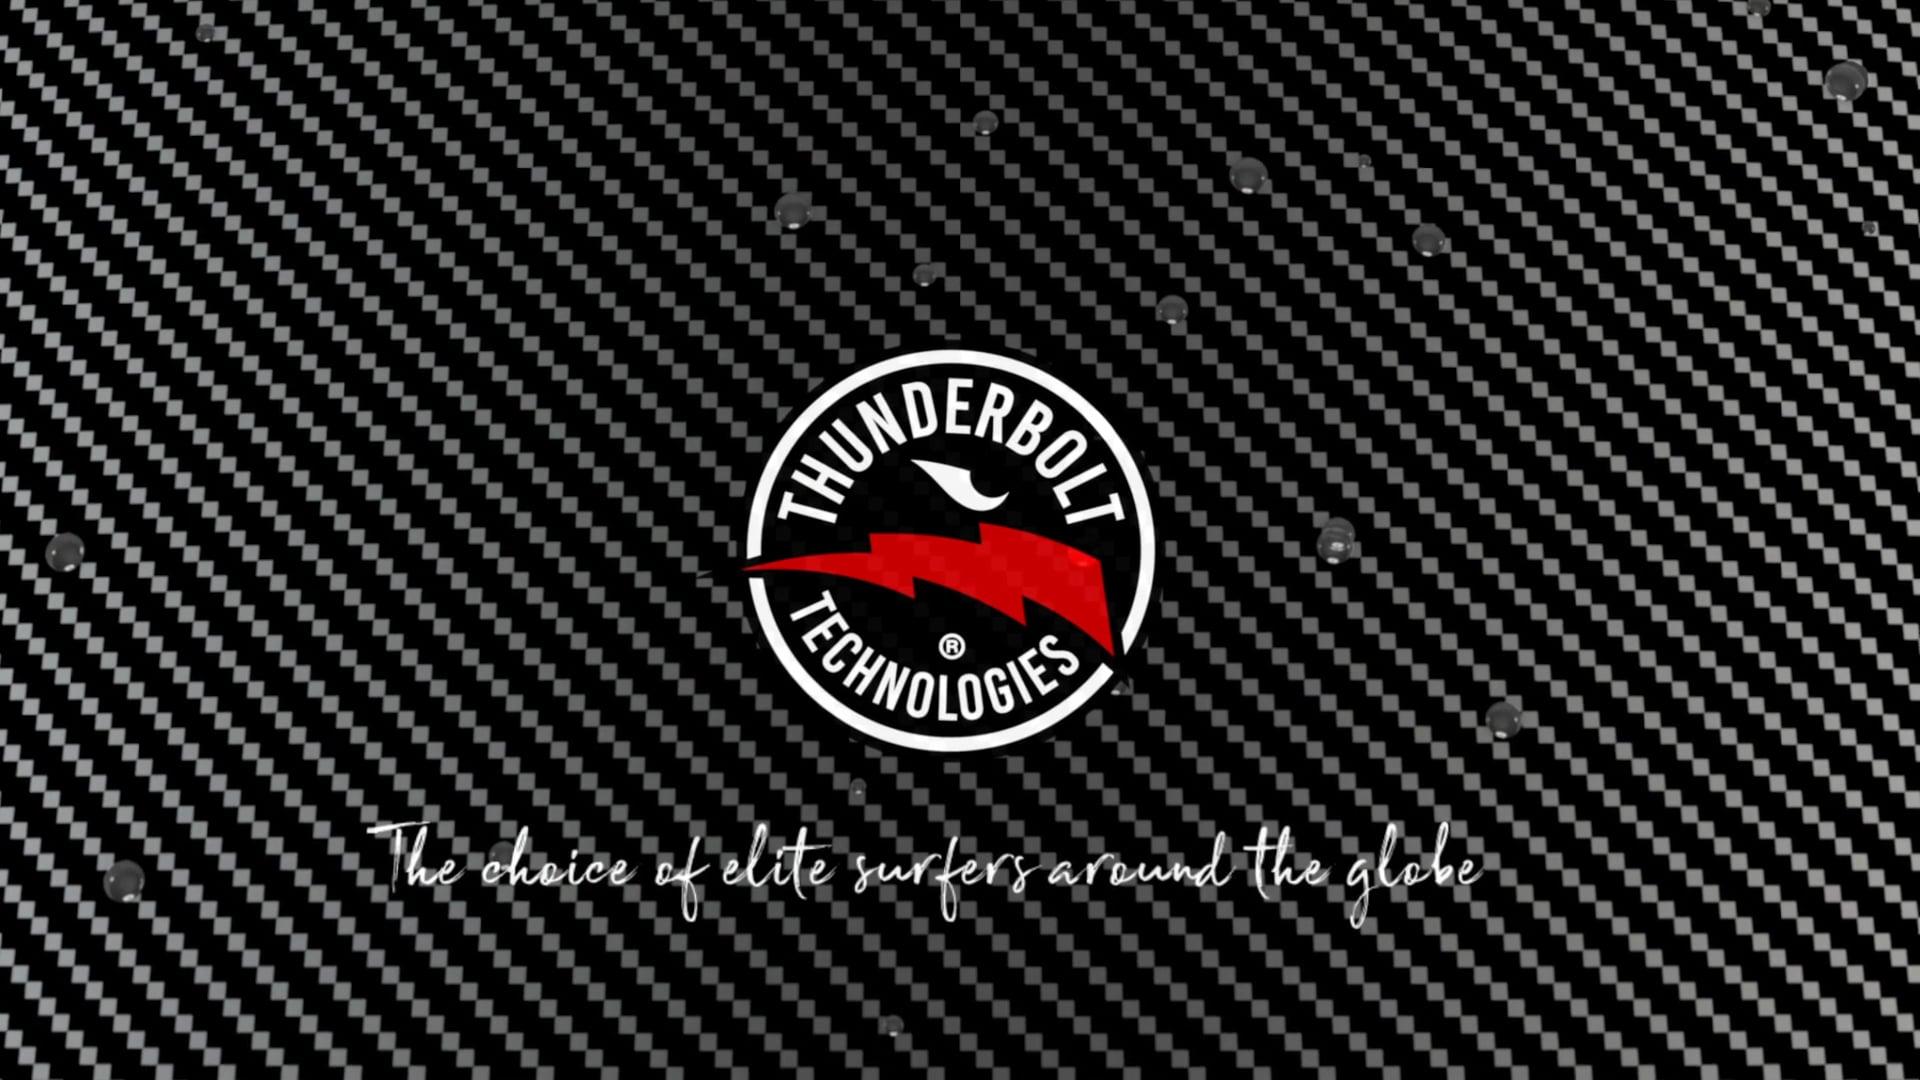 Thunderbolt Technologies